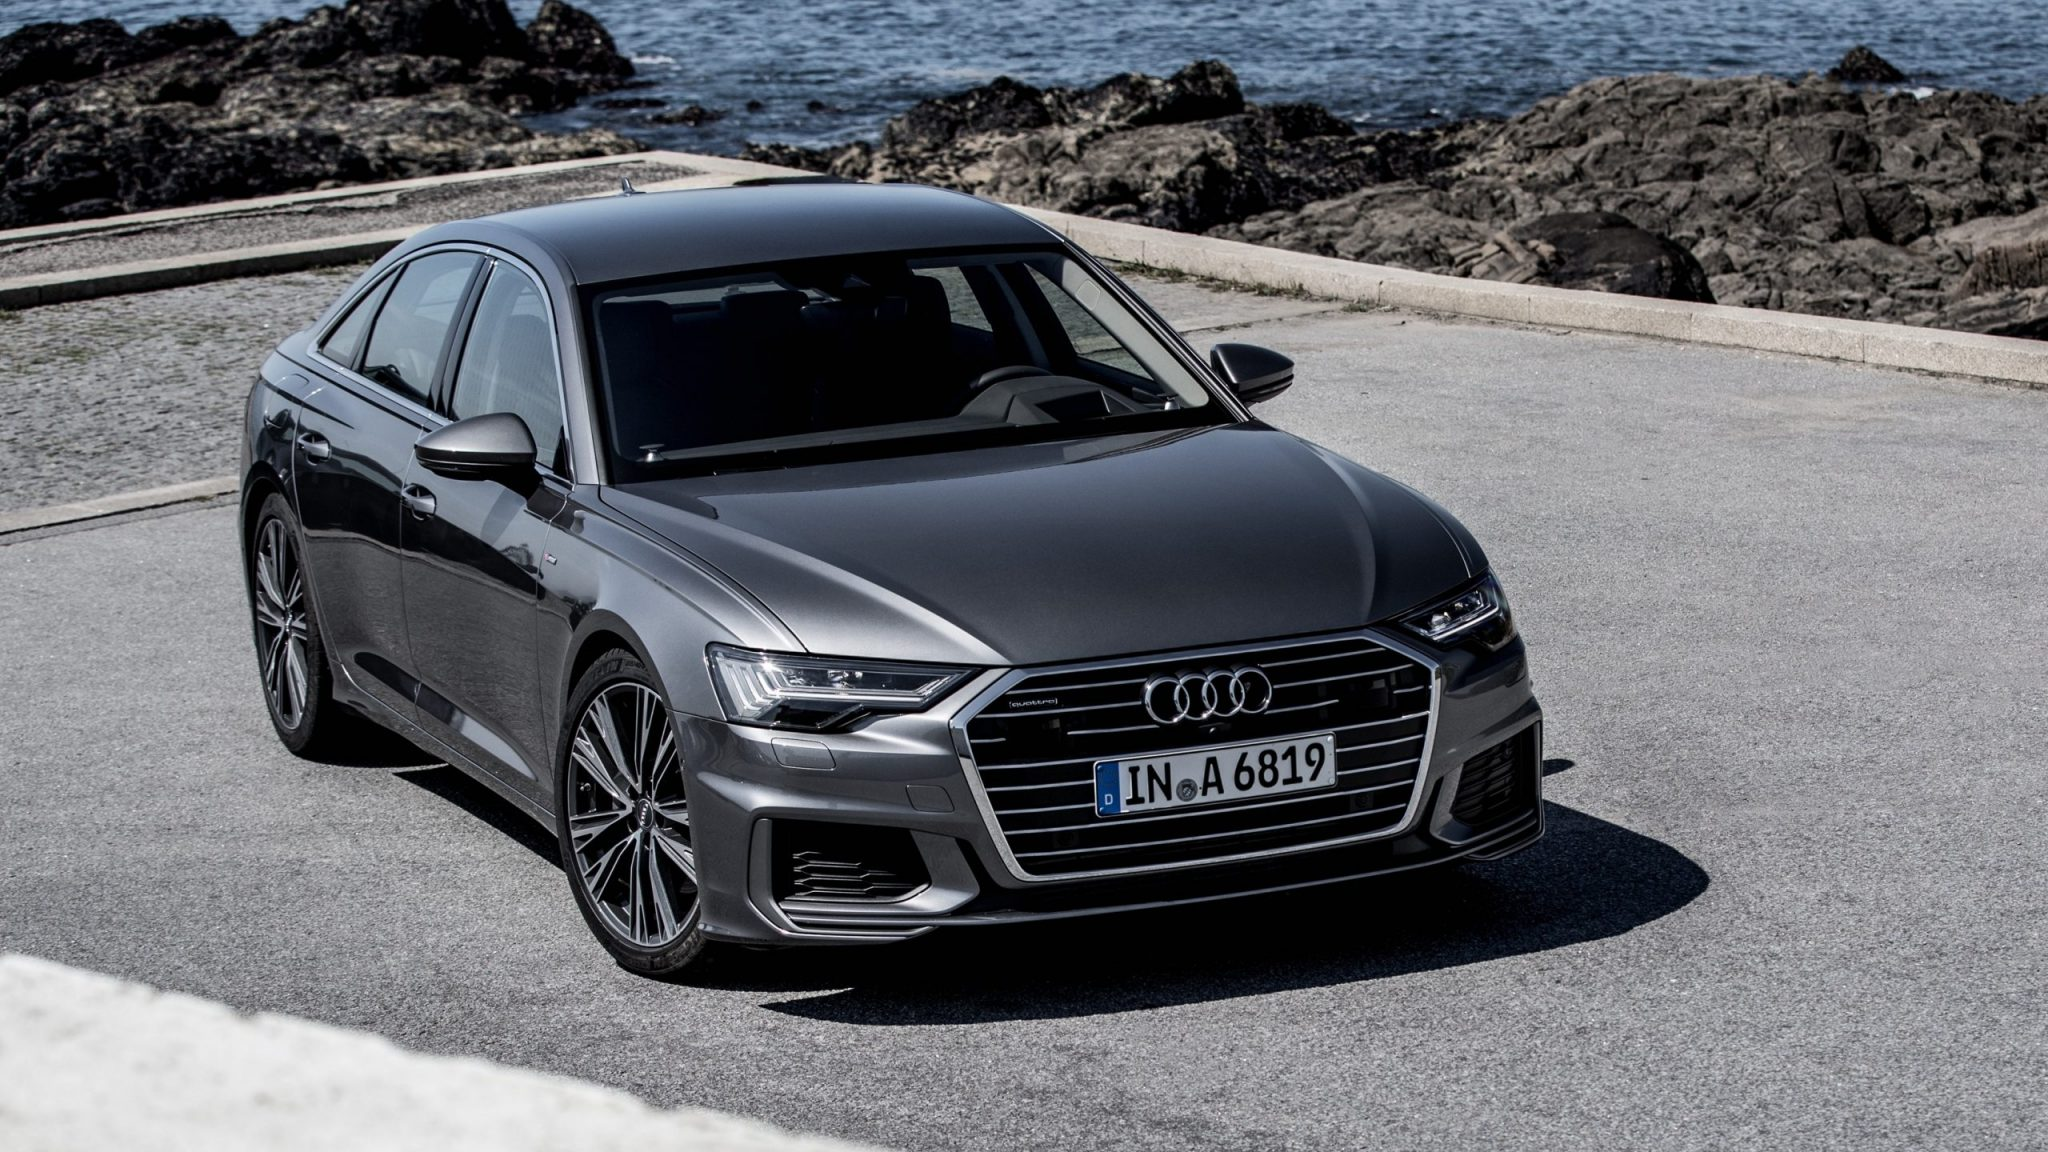 Audi A6 50 TDI quattro S line